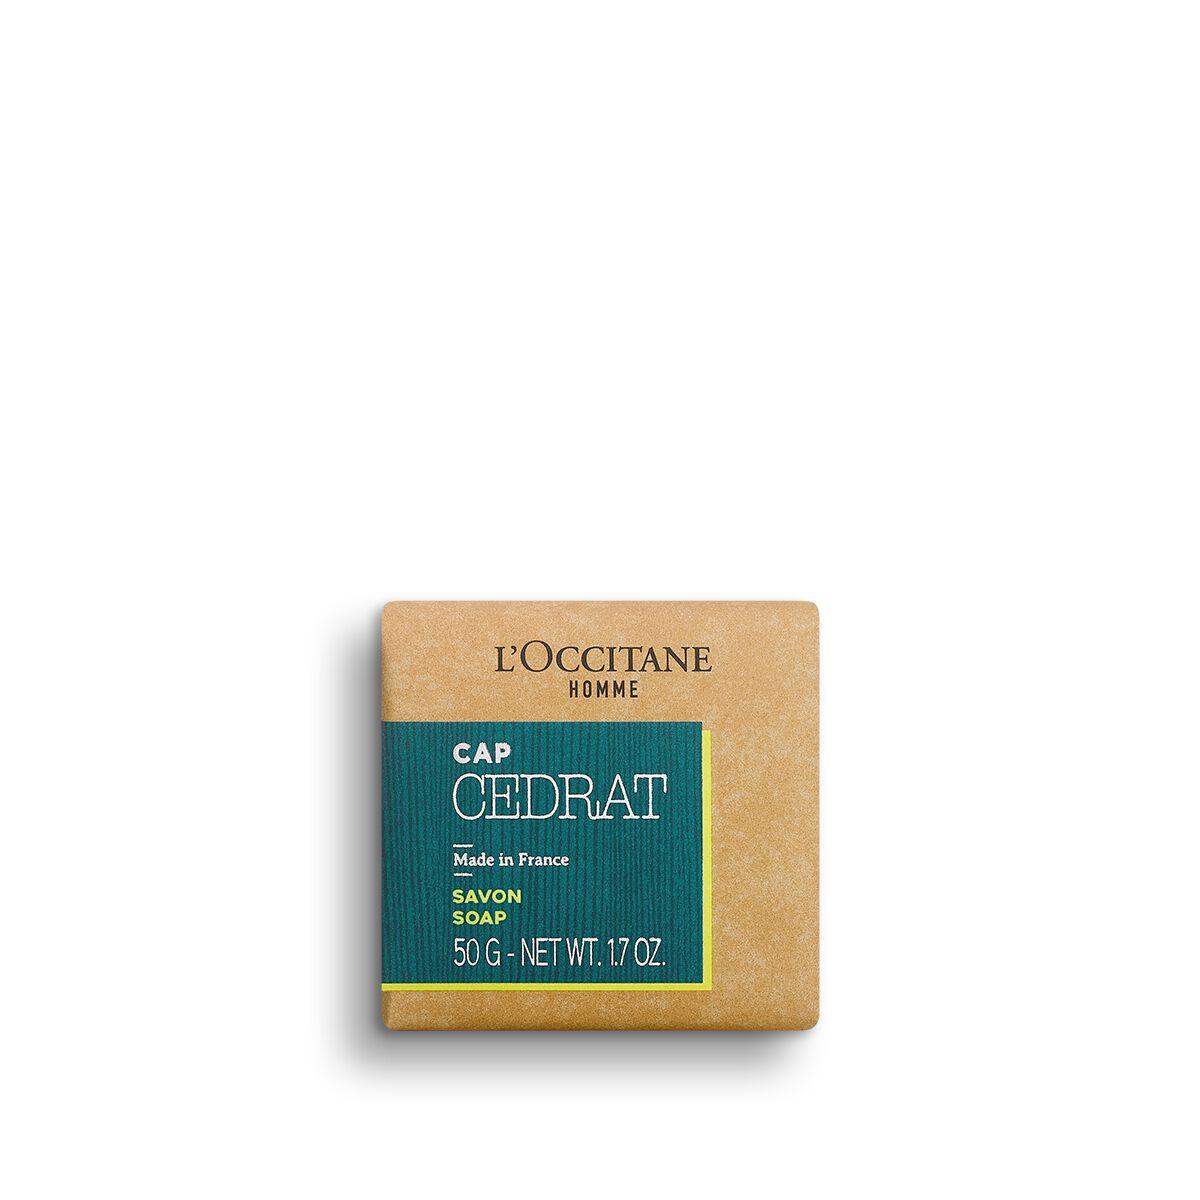 Cap Cédrat Soap 50 g. - L'OCCITANE